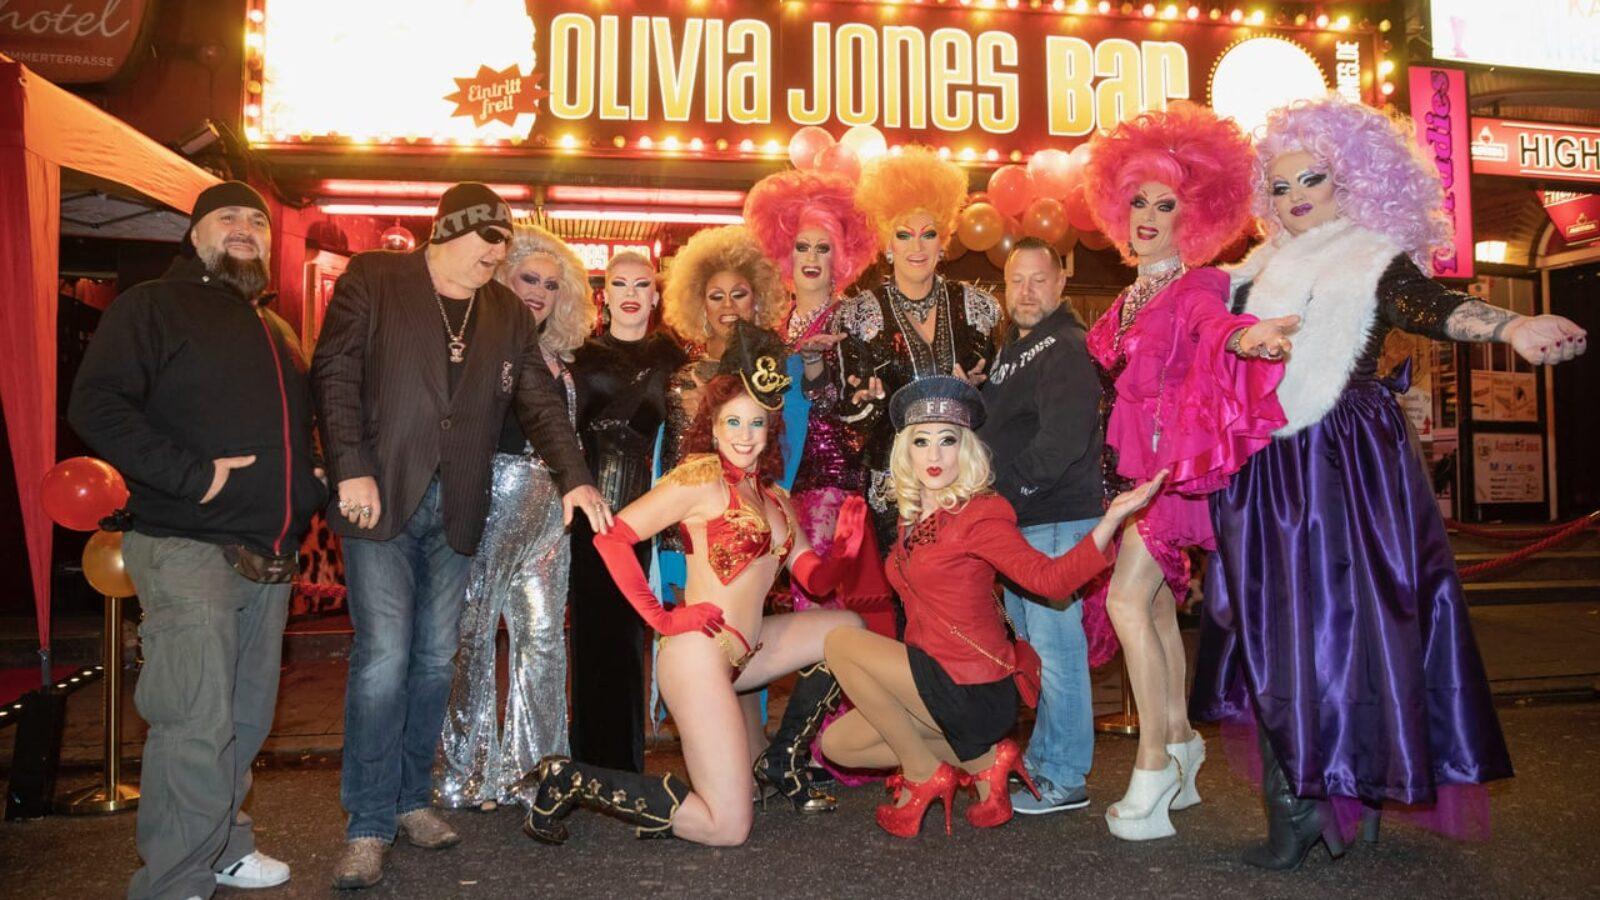 Olivia Jones Bar feiert Jubiläum